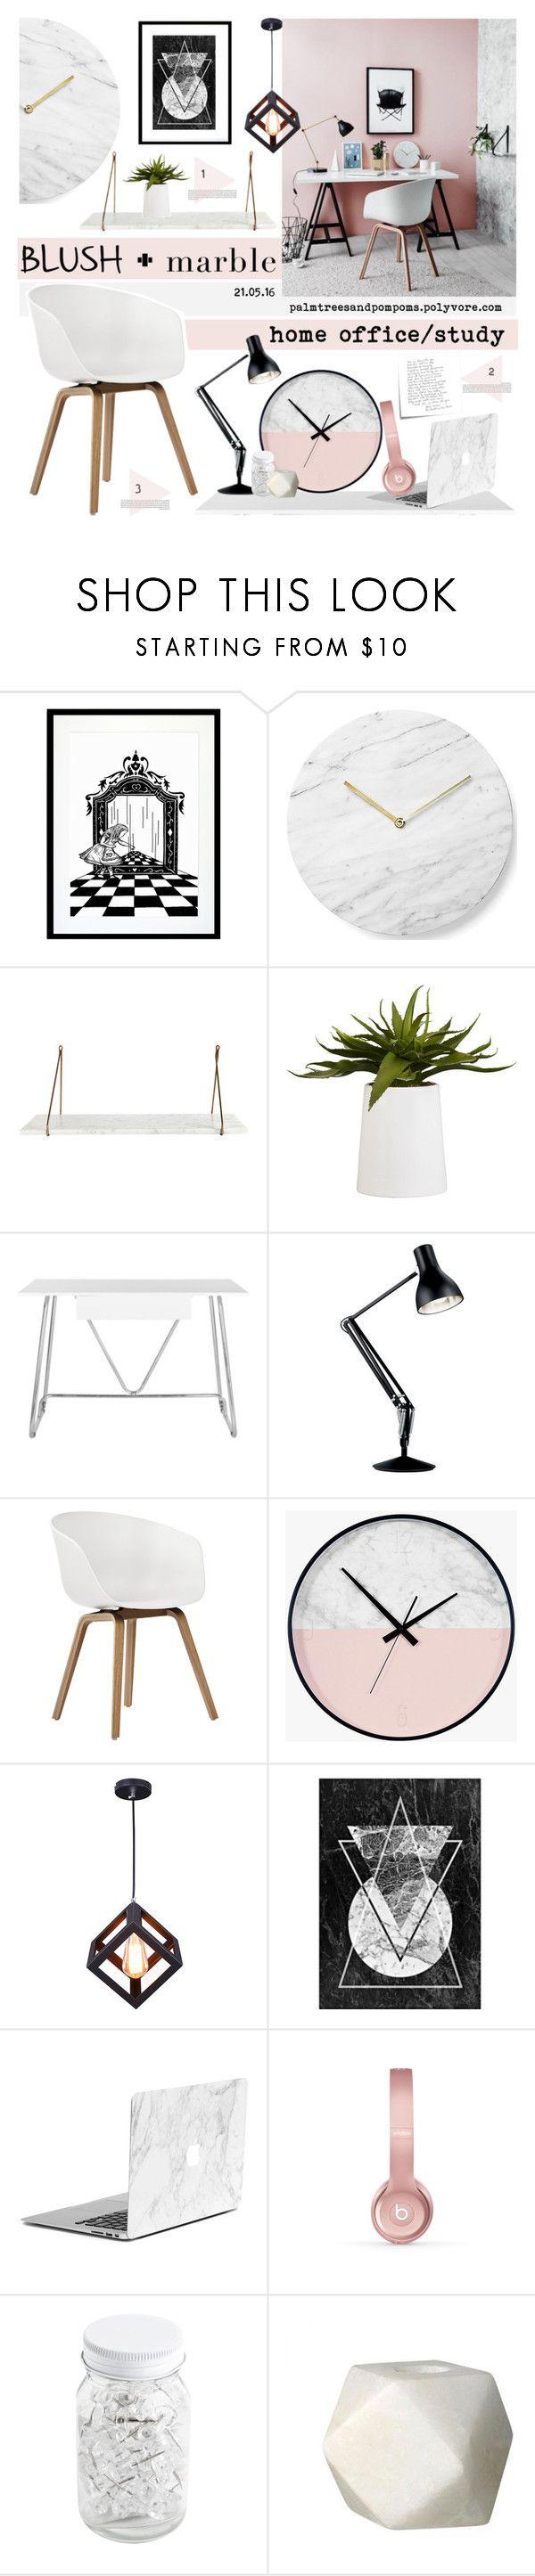 """Blush + Marble"" by palmtreesandpompoms ❤ liked on Polyvore featuring interior, interiors, interior design, home, home decor, interior decorating, Eleanor Stuart, Menu, CB2 and Safavieh"